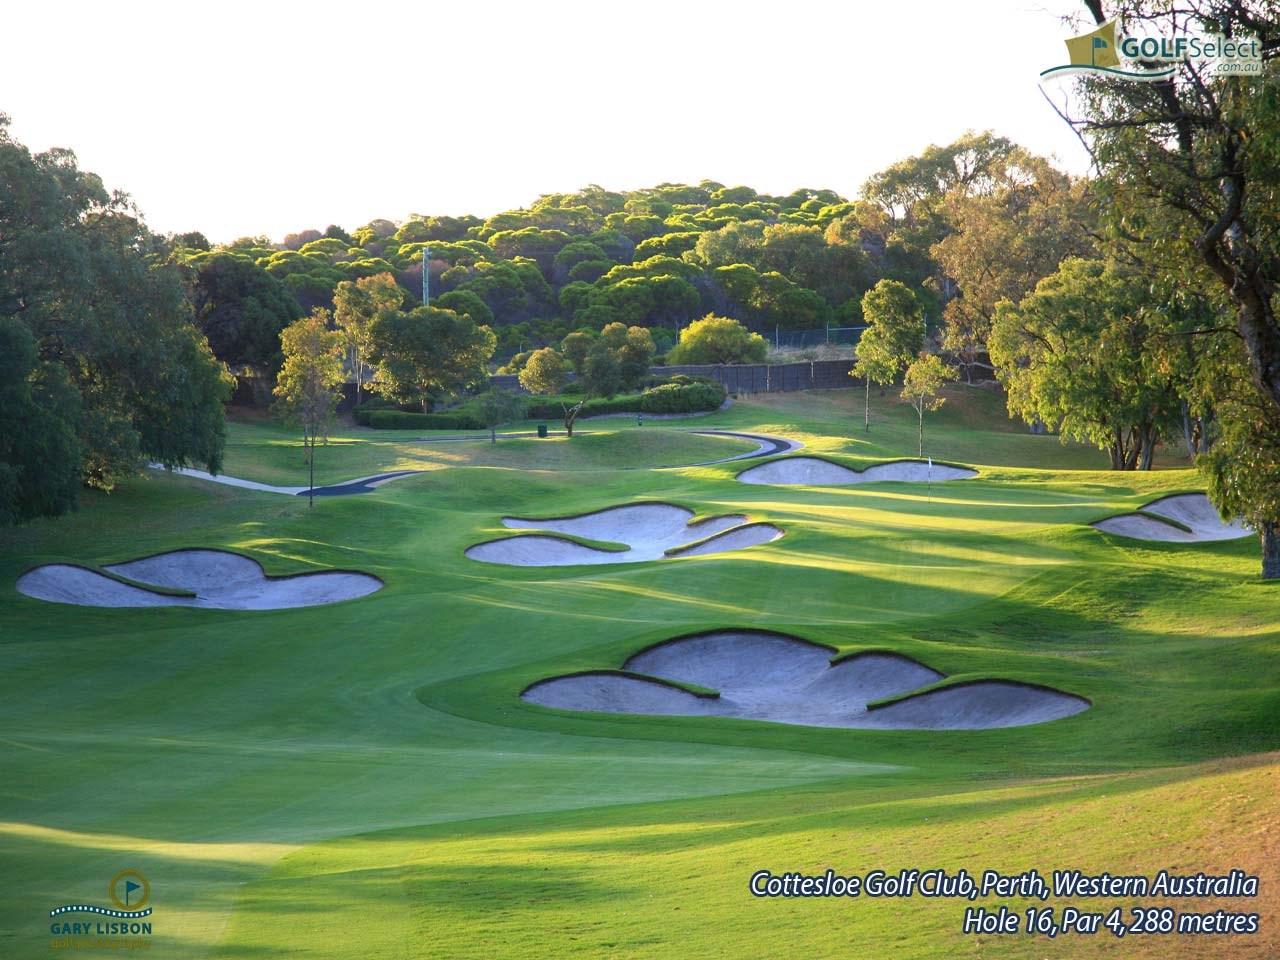 golfselect golf wallpaper cottesloe golf club hole 16 par 4 288 metres. Black Bedroom Furniture Sets. Home Design Ideas